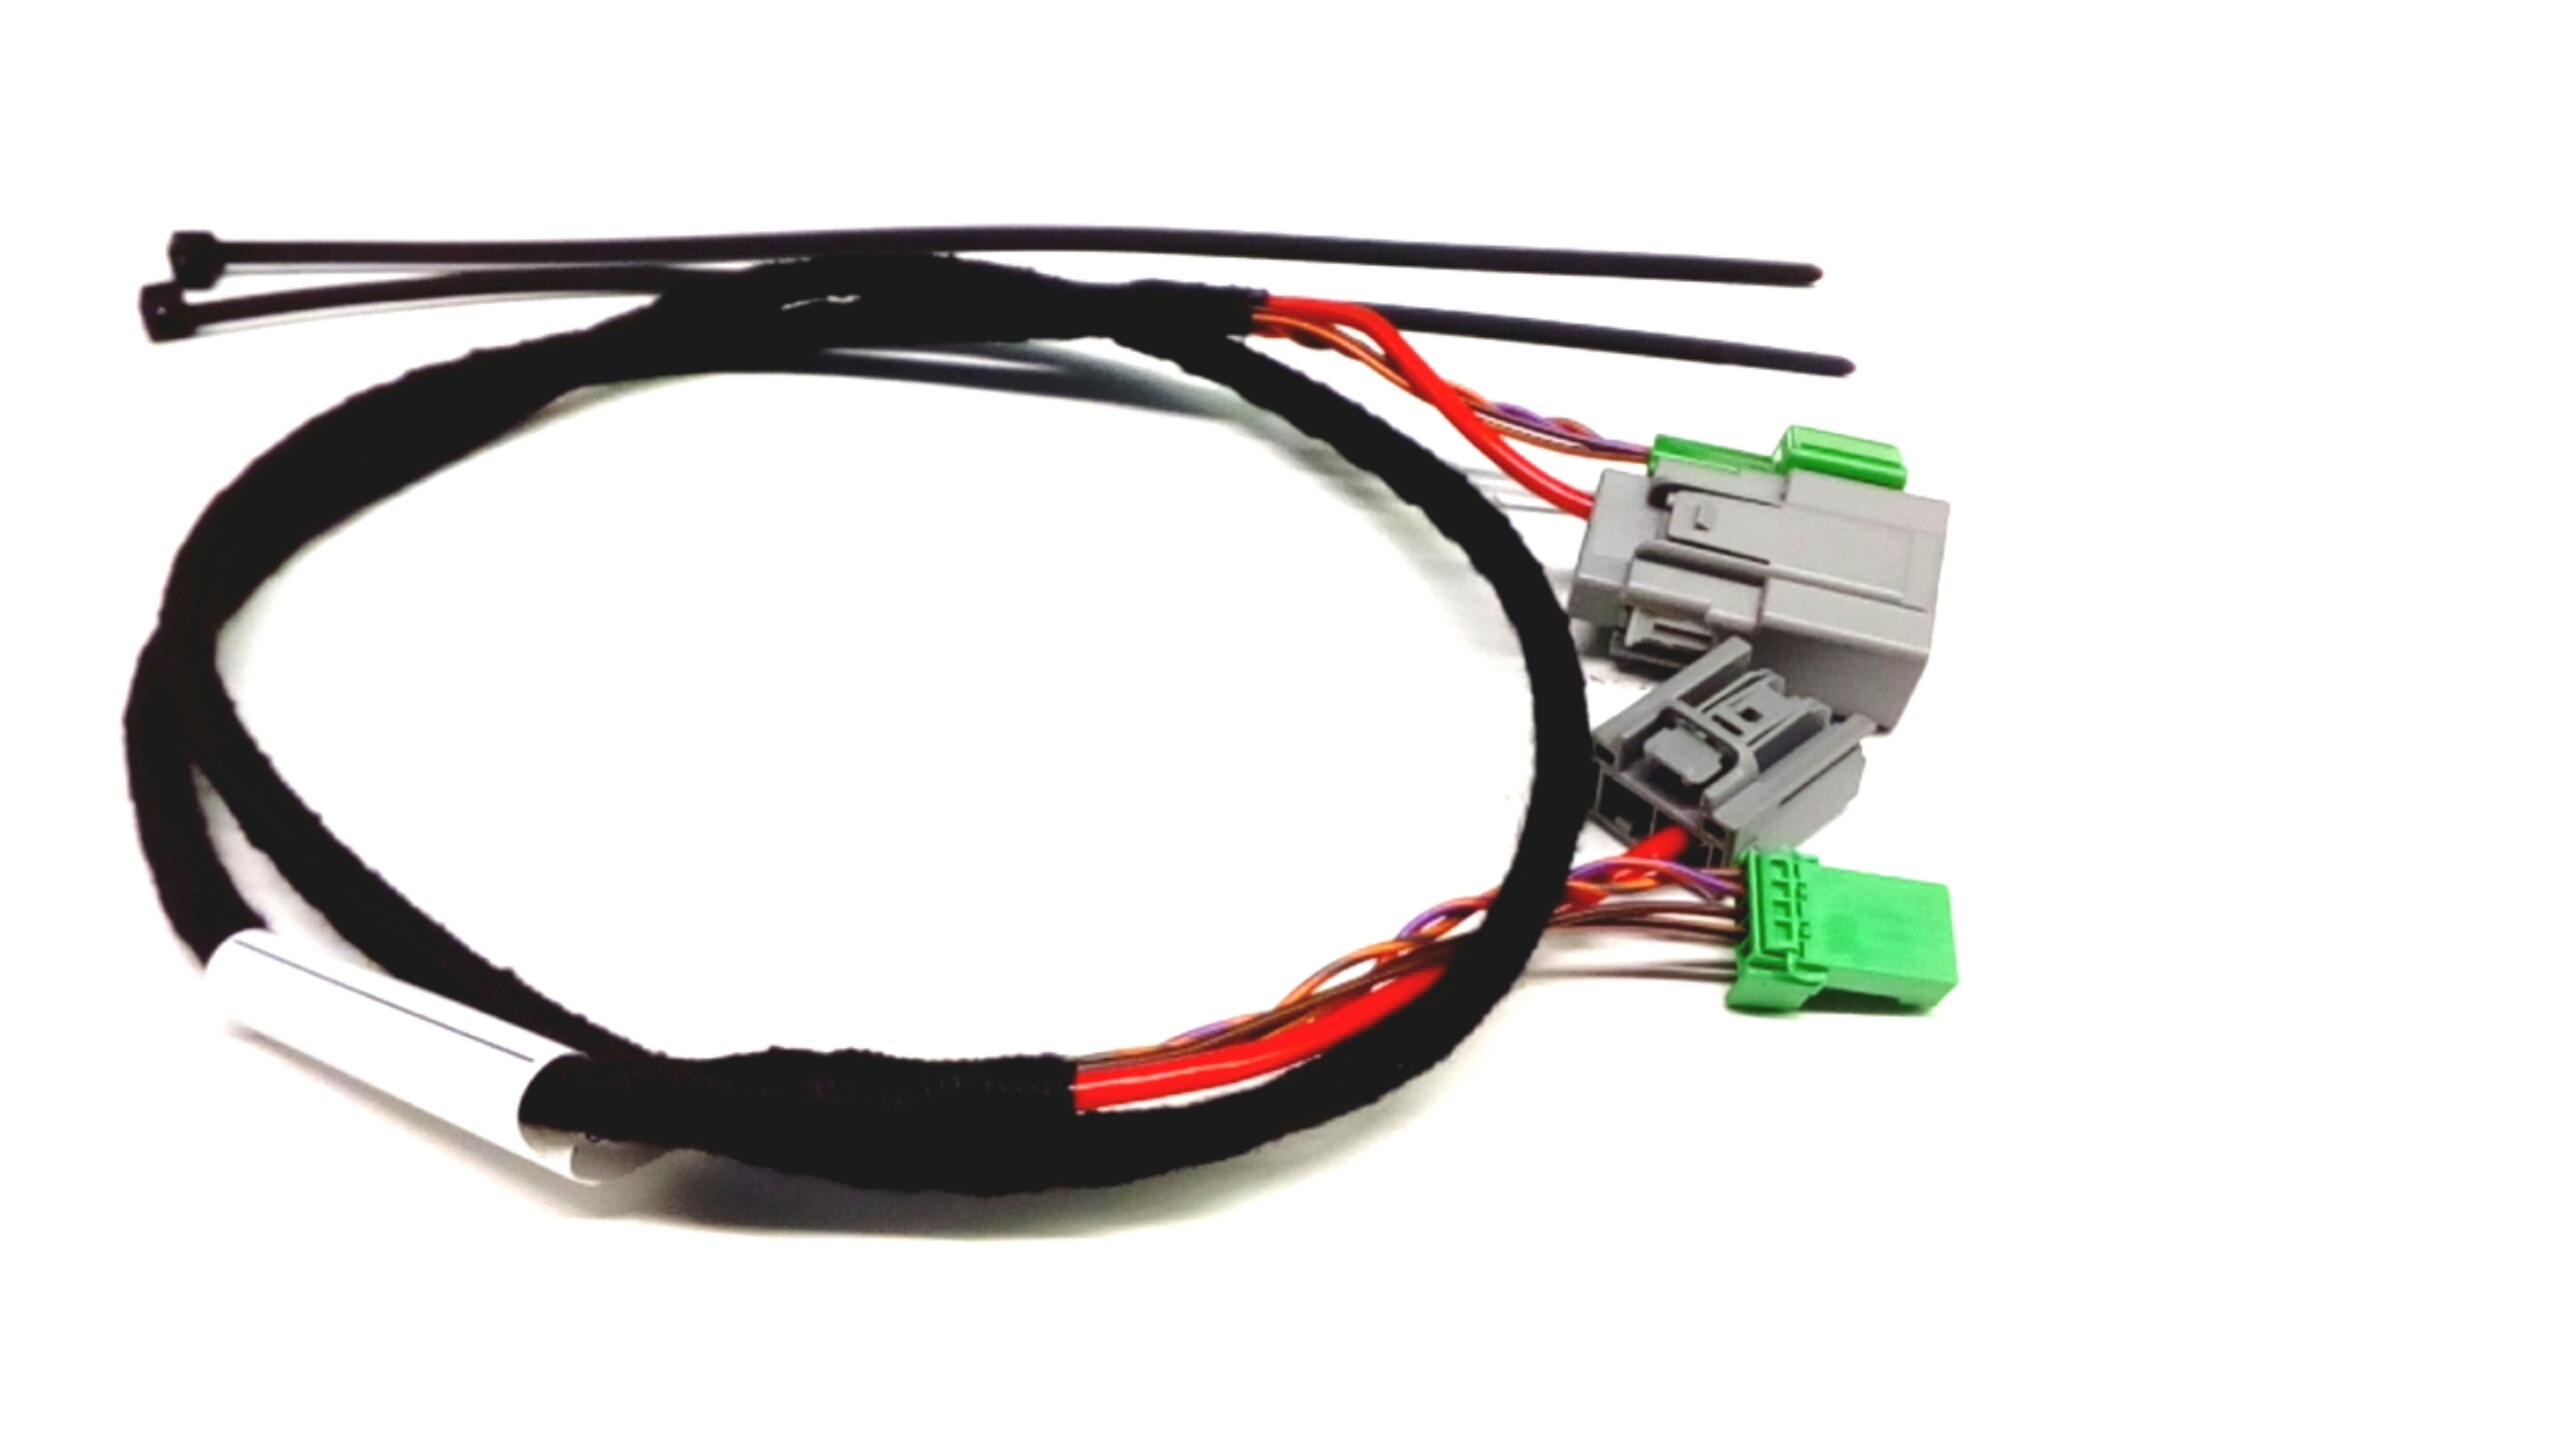 31346554  Volvo    Wiring    harness Towbar     wiring    13pin